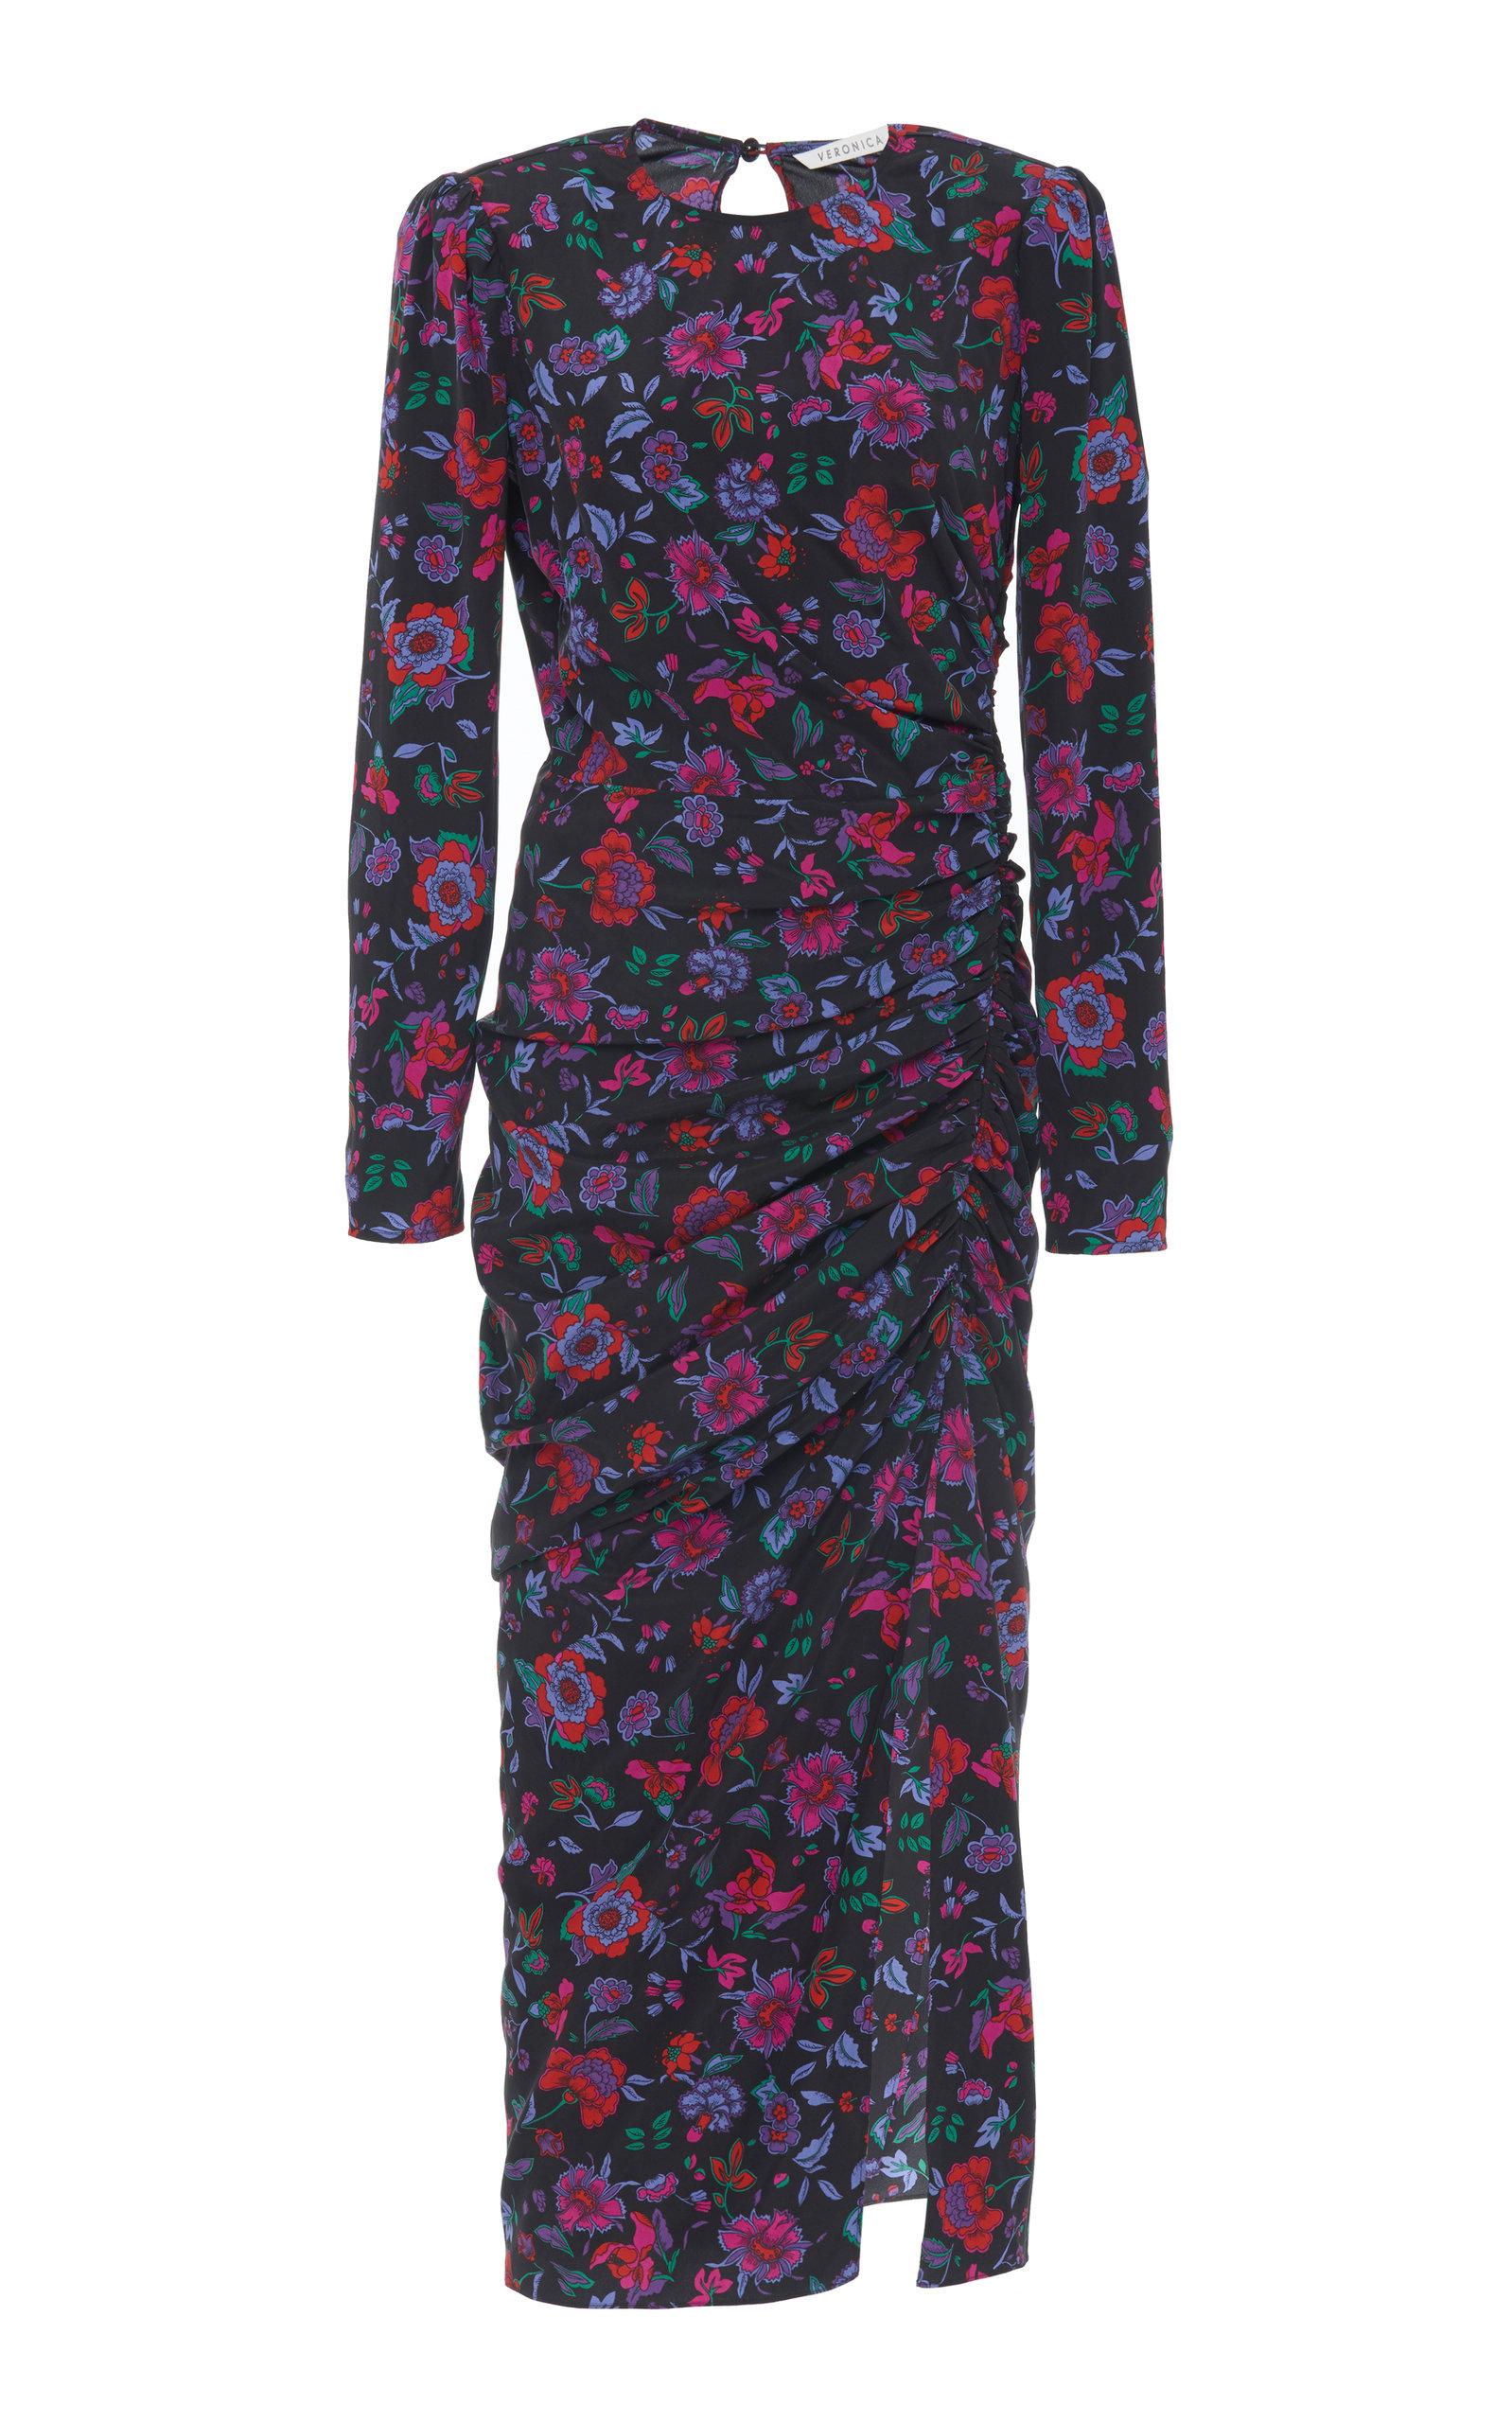 317e7827c Veronica BeardSelena Ruched Floral-Print Silk-Blend Midi Dress. CLOSE.  Loading